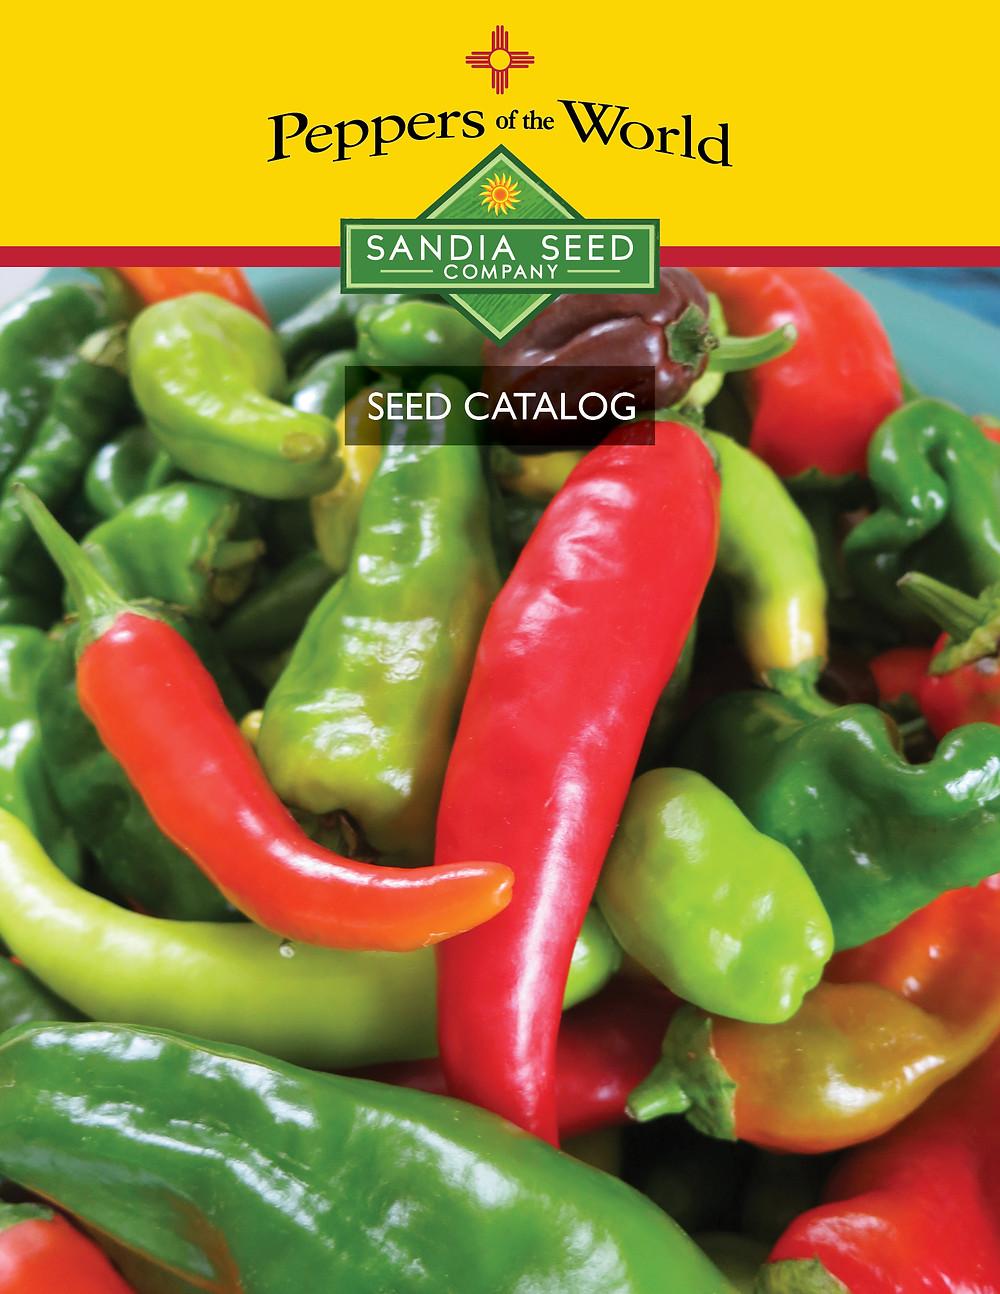 Seed Catalog Designer for Sandia Seed